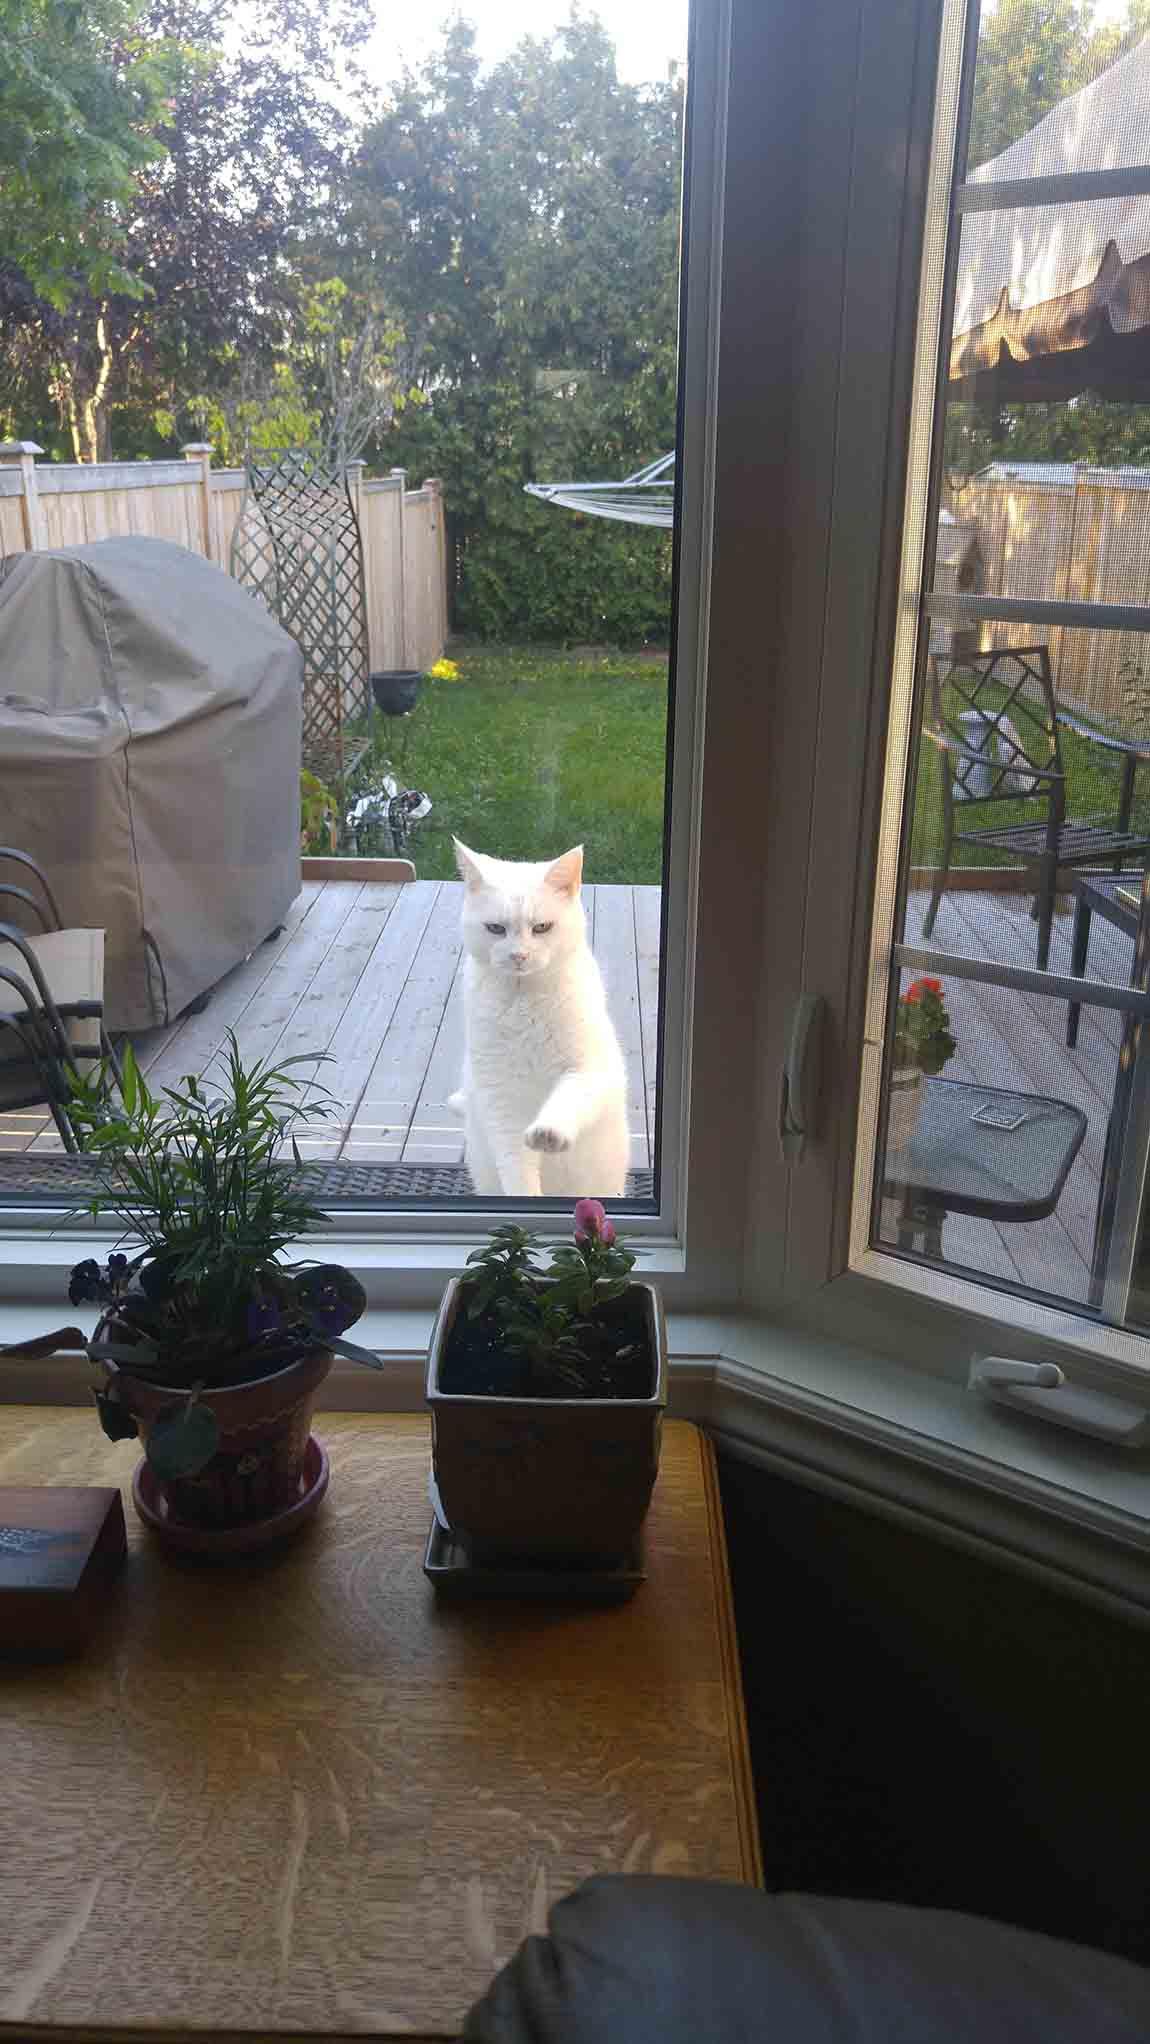 Gato visita a su vecino por golosinas